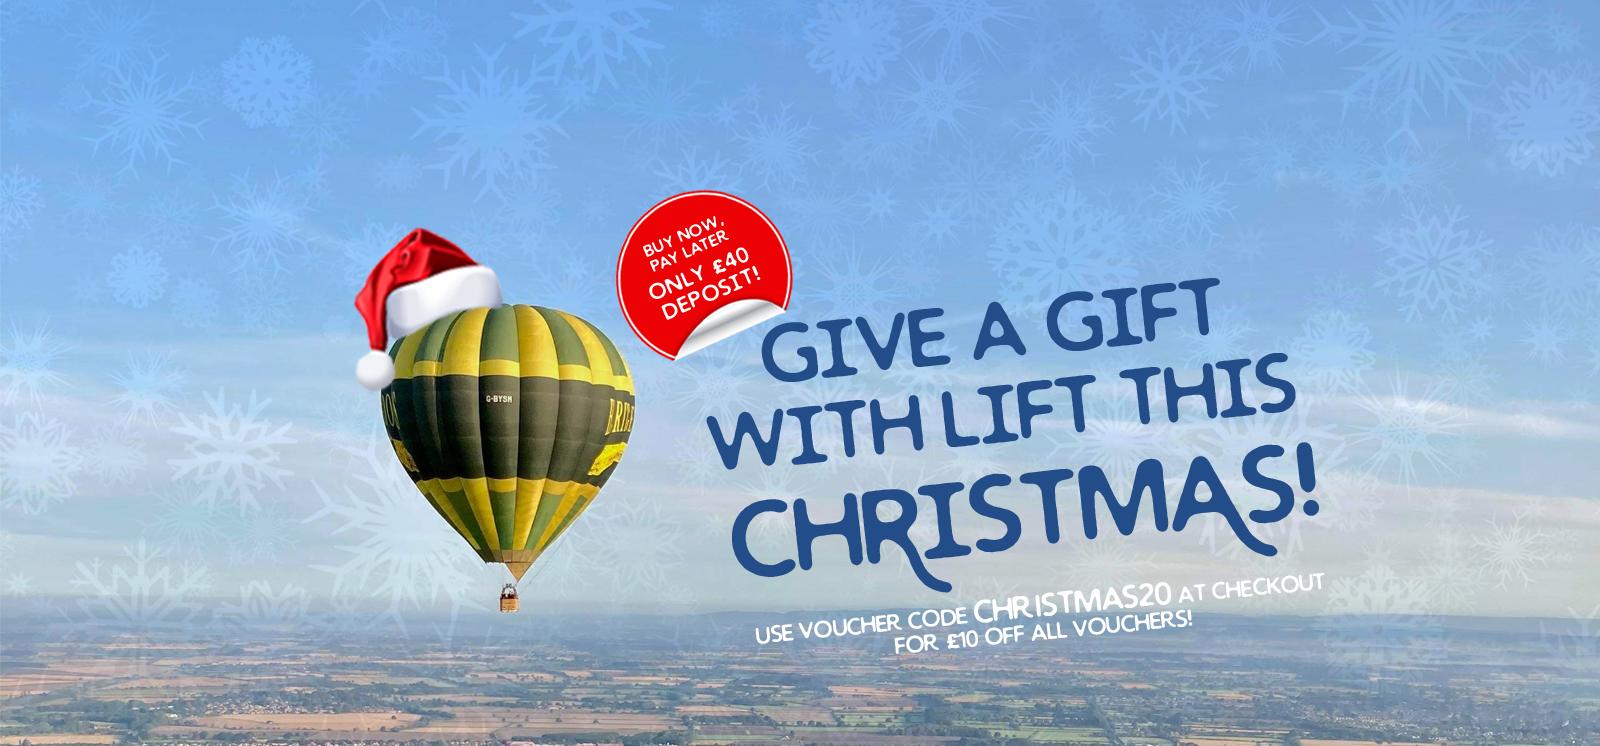 Yorkshire Balloon Flights Christmas Gift Deposit